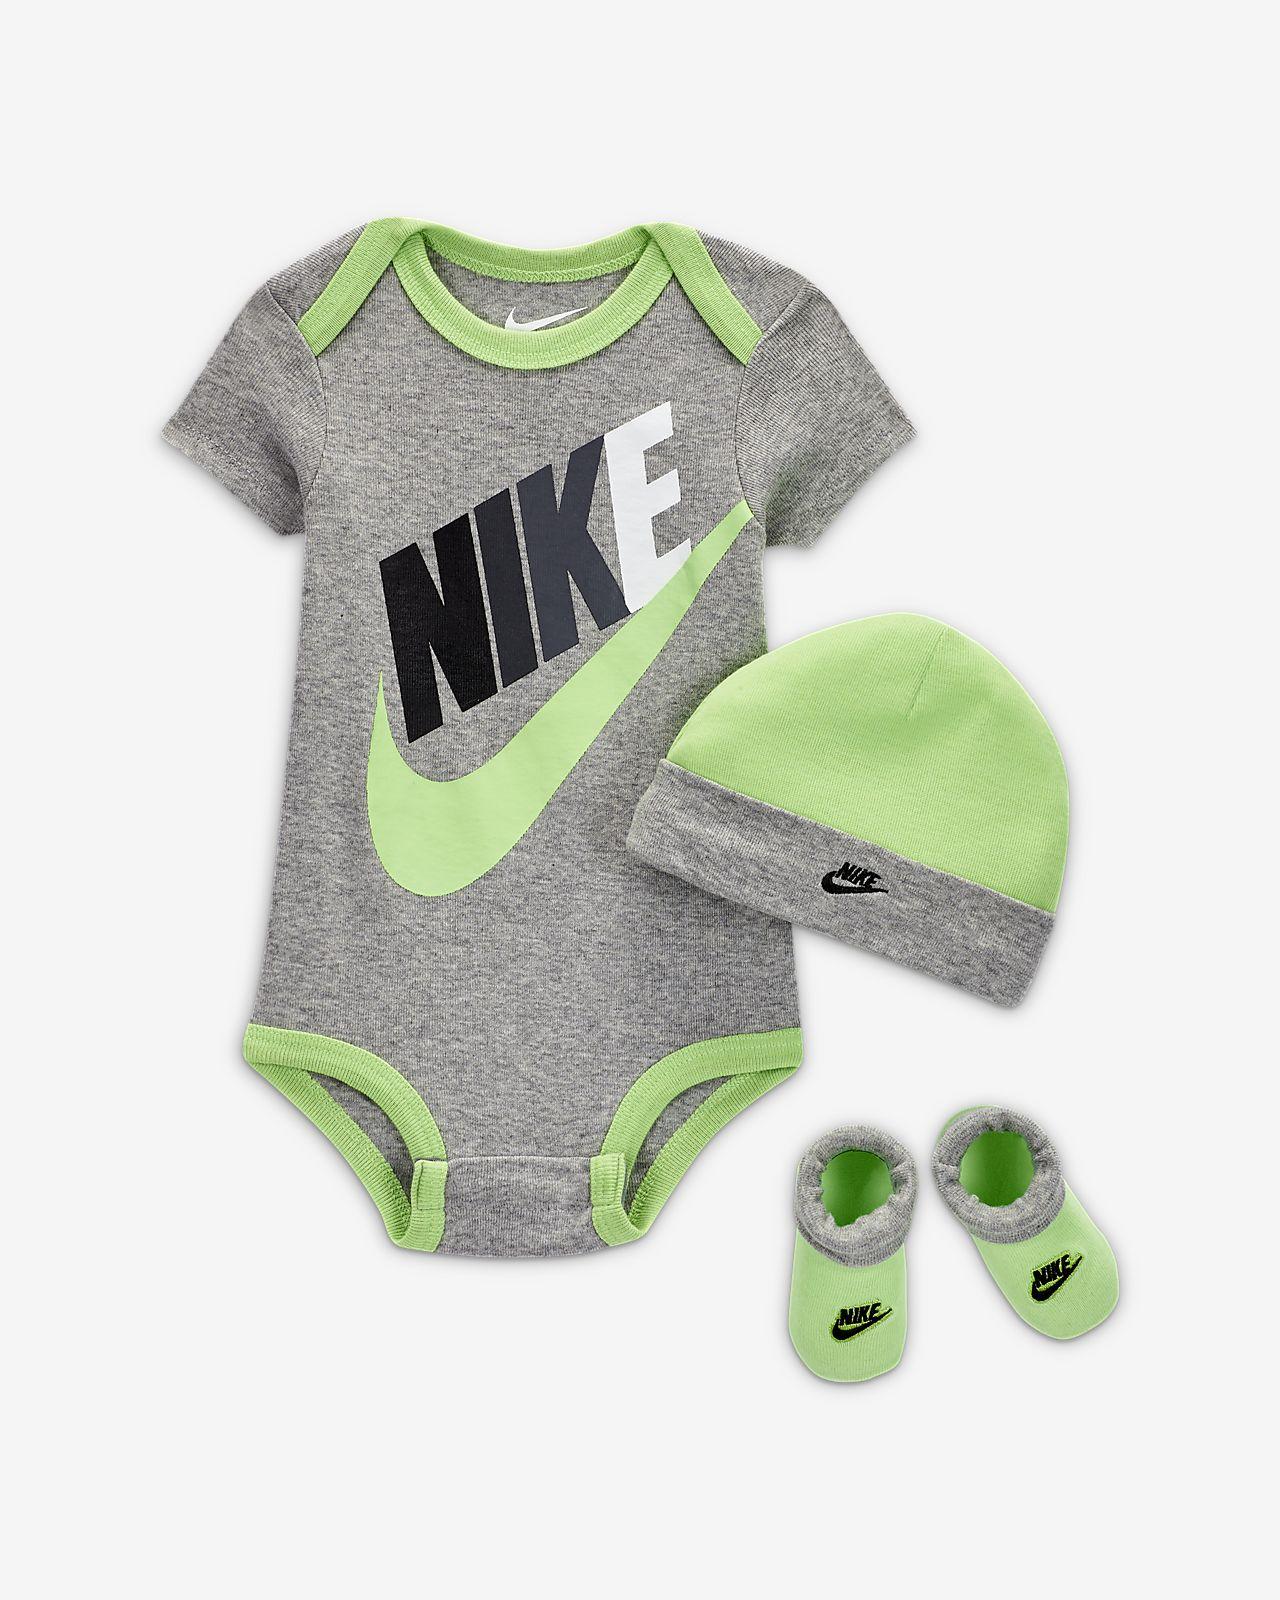 NIKE Sportswear Set, 3er Pack, Body, Mütze, Schuhe, für